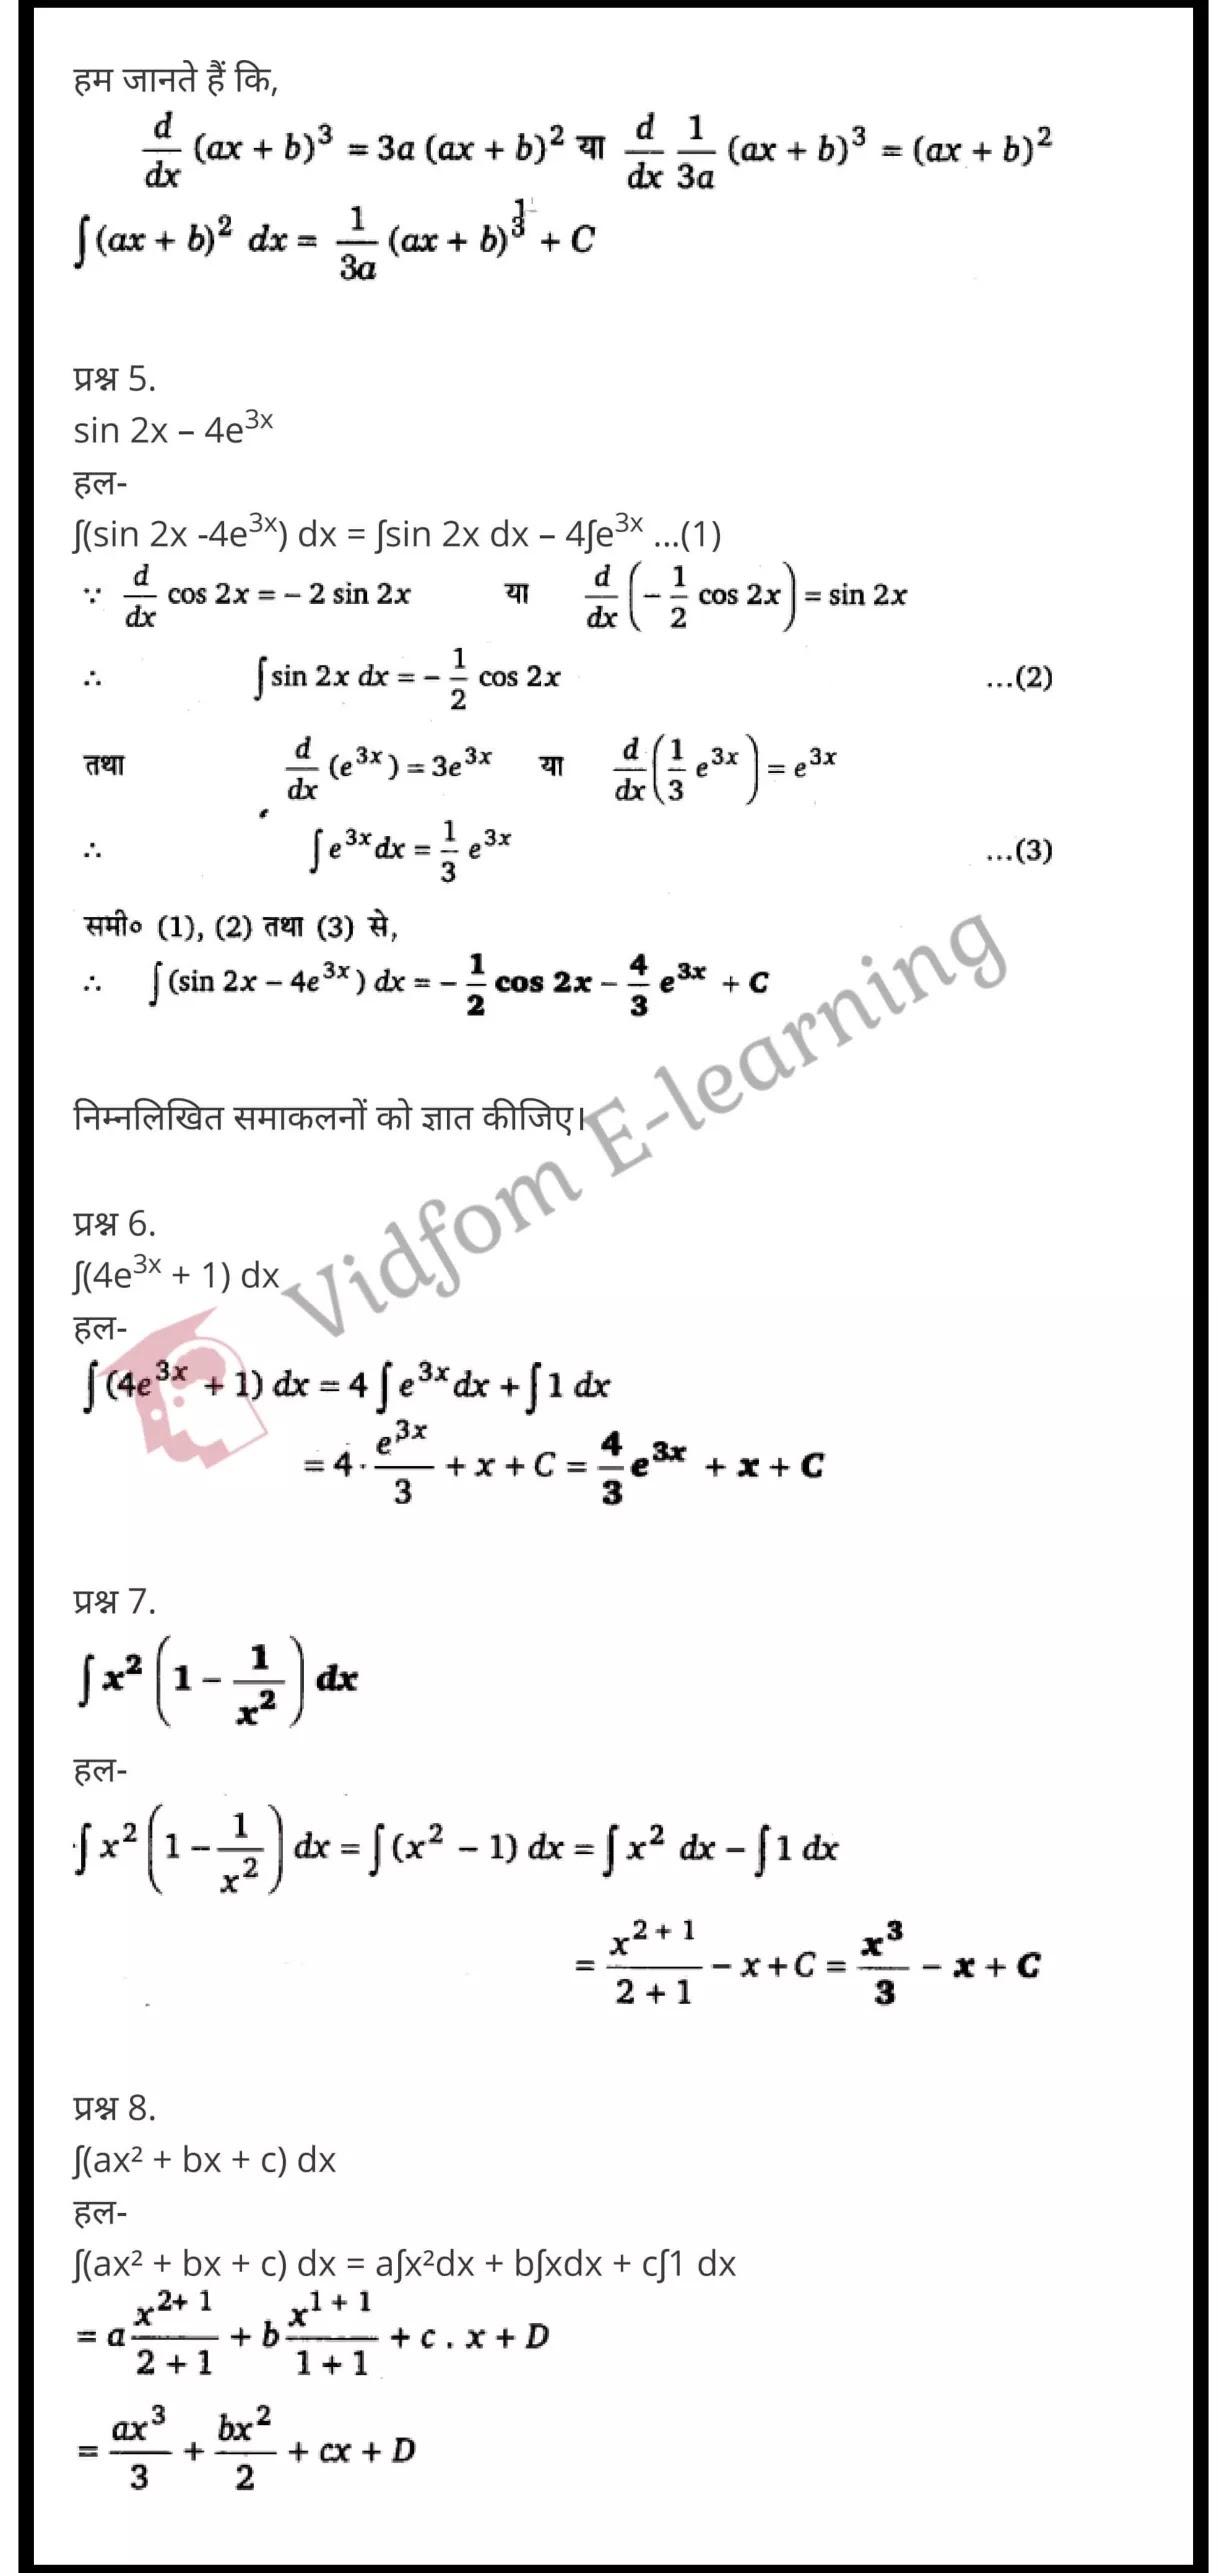 कक्षा 12 गणित  के नोट्स  हिंदी में एनसीईआरटी समाधान,     class 12 Maths Chapter 7,   class 12 Maths Chapter 7 ncert solutions in Hindi,   class 12 Maths Chapter 7 notes in hindi,   class 12 Maths Chapter 7 question answer,   class 12 Maths Chapter 7 notes,   class 12 Maths Chapter 7 class 12 Maths Chapter 7 in  hindi,    class 12 Maths Chapter 7 important questions in  hindi,   class 12 Maths Chapter 7 notes in hindi,    class 12 Maths Chapter 7 test,   class 12 Maths Chapter 7 pdf,   class 12 Maths Chapter 7 notes pdf,   class 12 Maths Chapter 7 exercise solutions,   class 12 Maths Chapter 7 notes study rankers,   class 12 Maths Chapter 7 notes,    class 12 Maths Chapter 7  class 12  notes pdf,   class 12 Maths Chapter 7 class 12  notes  ncert,   class 12 Maths Chapter 7 class 12 pdf,   class 12 Maths Chapter 7  book,   class 12 Maths Chapter 7 quiz class 12  ,    10  th class 12 Maths Chapter 7  book up board,   up board 10  th class 12 Maths Chapter 7 notes,  class 12 Maths,   class 12 Maths ncert solutions in Hindi,   class 12 Maths notes in hindi,   class 12 Maths question answer,   class 12 Maths notes,  class 12 Maths class 12 Maths Chapter 7 in  hindi,    class 12 Maths important questions in  hindi,   class 12 Maths notes in hindi,    class 12 Maths test,  class 12 Maths class 12 Maths Chapter 7 pdf,   class 12 Maths notes pdf,   class 12 Maths exercise solutions,   class 12 Maths,  class 12 Maths notes study rankers,   class 12 Maths notes,  class 12 Maths notes,   class 12 Maths  class 12  notes pdf,   class 12 Maths class 12  notes  ncert,   class 12 Maths class 12 pdf,   class 12 Maths  book,  class 12 Maths quiz class 12  ,  10  th class 12 Maths    book up board,    up board 10  th class 12 Maths notes,      कक्षा 12 गणित अध्याय 7 ,  कक्षा 12 गणित, कक्षा 12 गणित अध्याय 7  के नोट्स हिंदी में,  कक्षा 12 का हिंदी अध्याय 7 का प्रश्न उत्तर,  कक्षा 12 गणित अध्याय 7 के नोट्स,  10 कक्षा गणित  हिंदी में, कक्षा 12 गणित अध्याय 7  हिंदी में,  कक्षा 12 गणित अध्याय